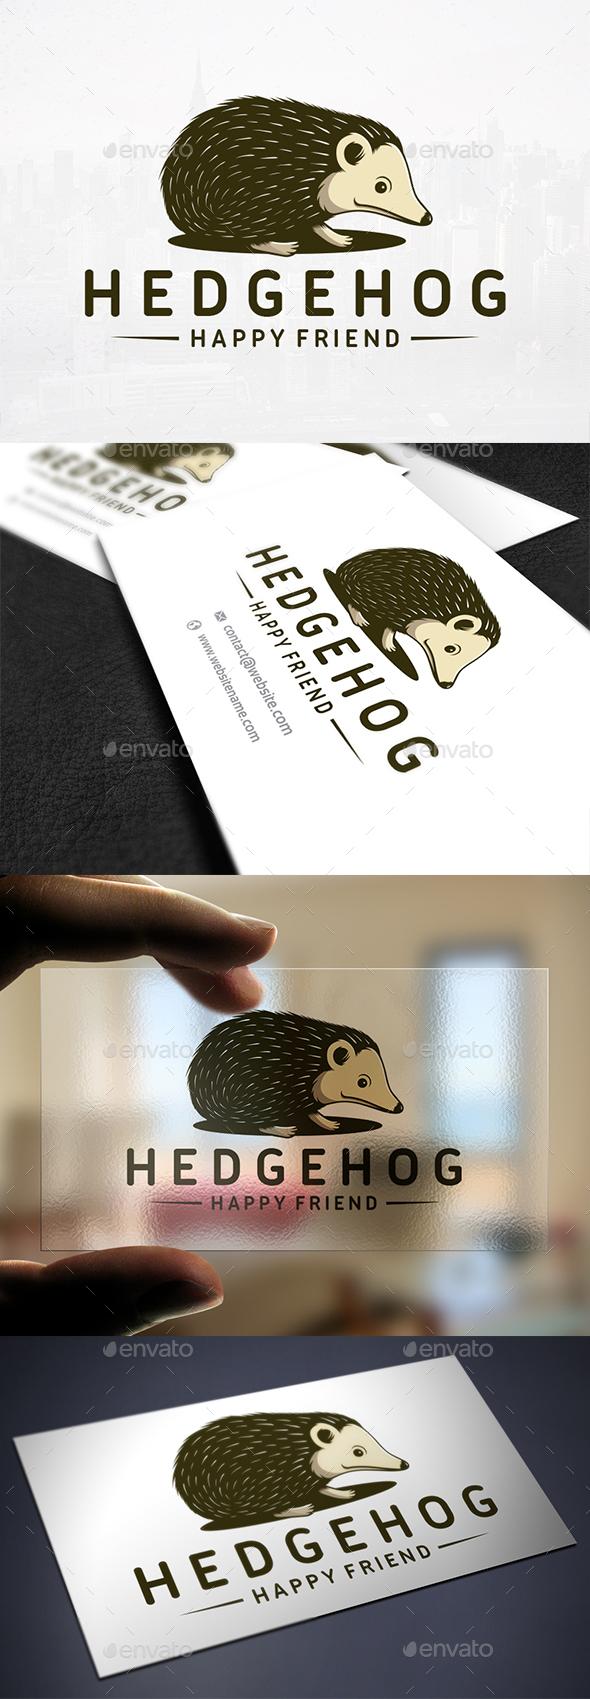 Illustrative Hedgehog Logo Template - Animals Logo Templates